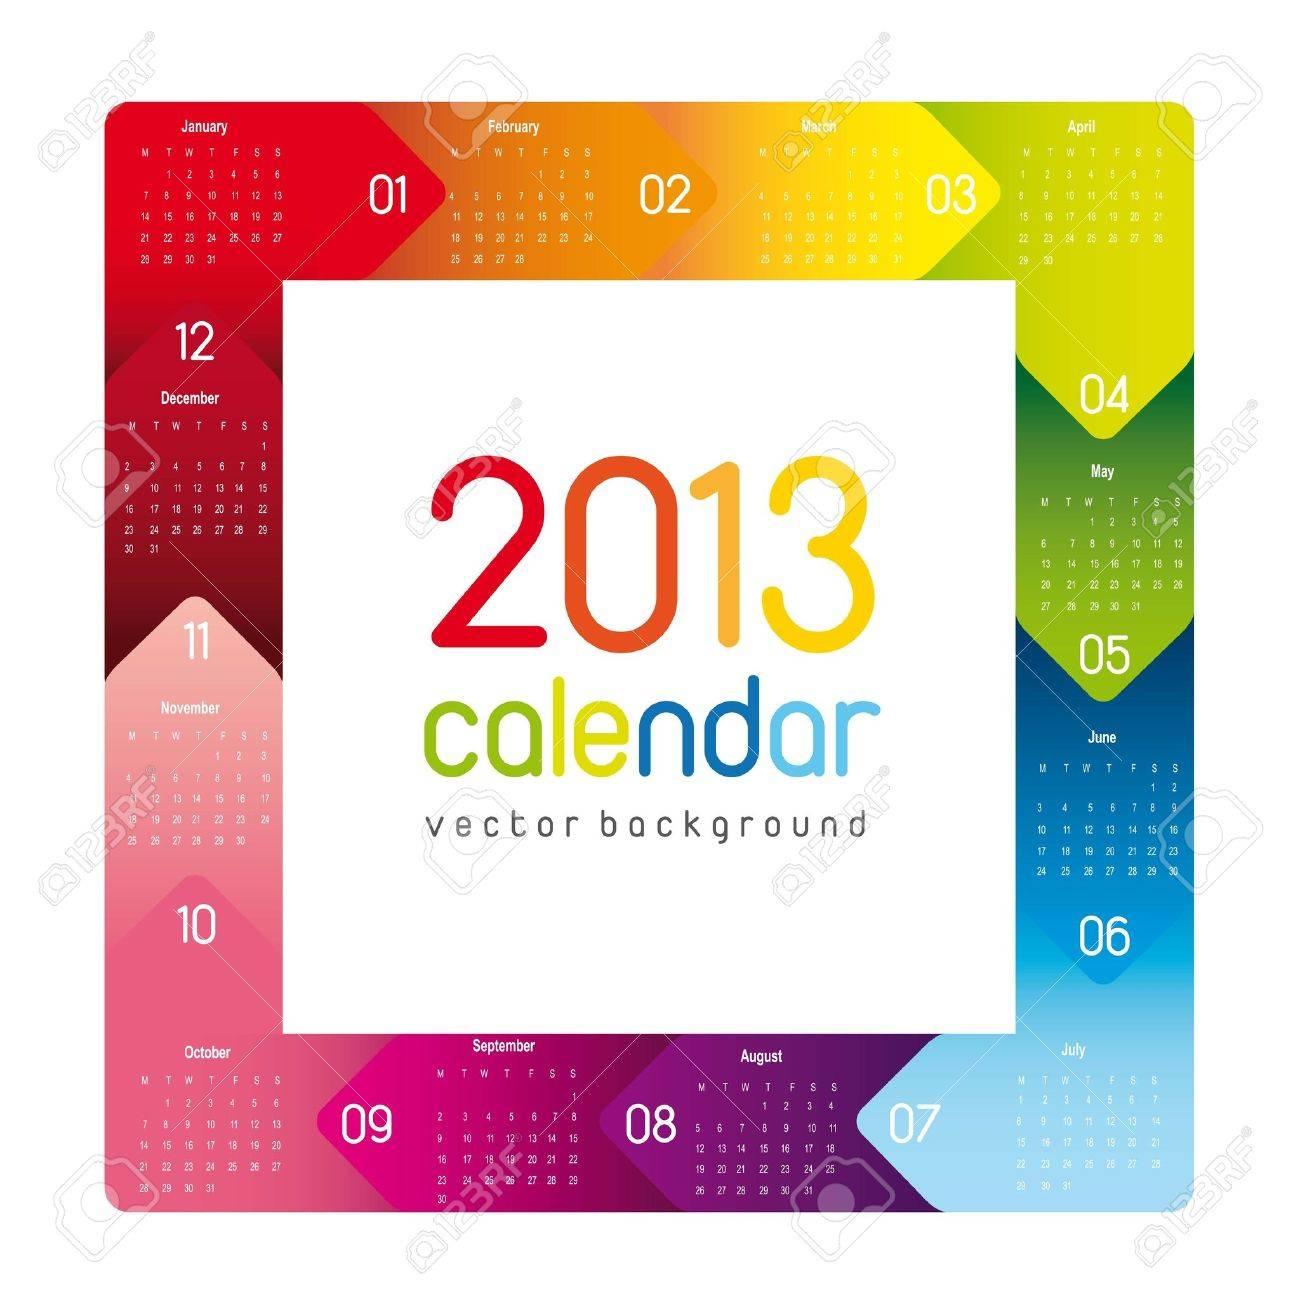 colorful 2013 calendar, square shape. vector illustration Stock Vector - 14877111